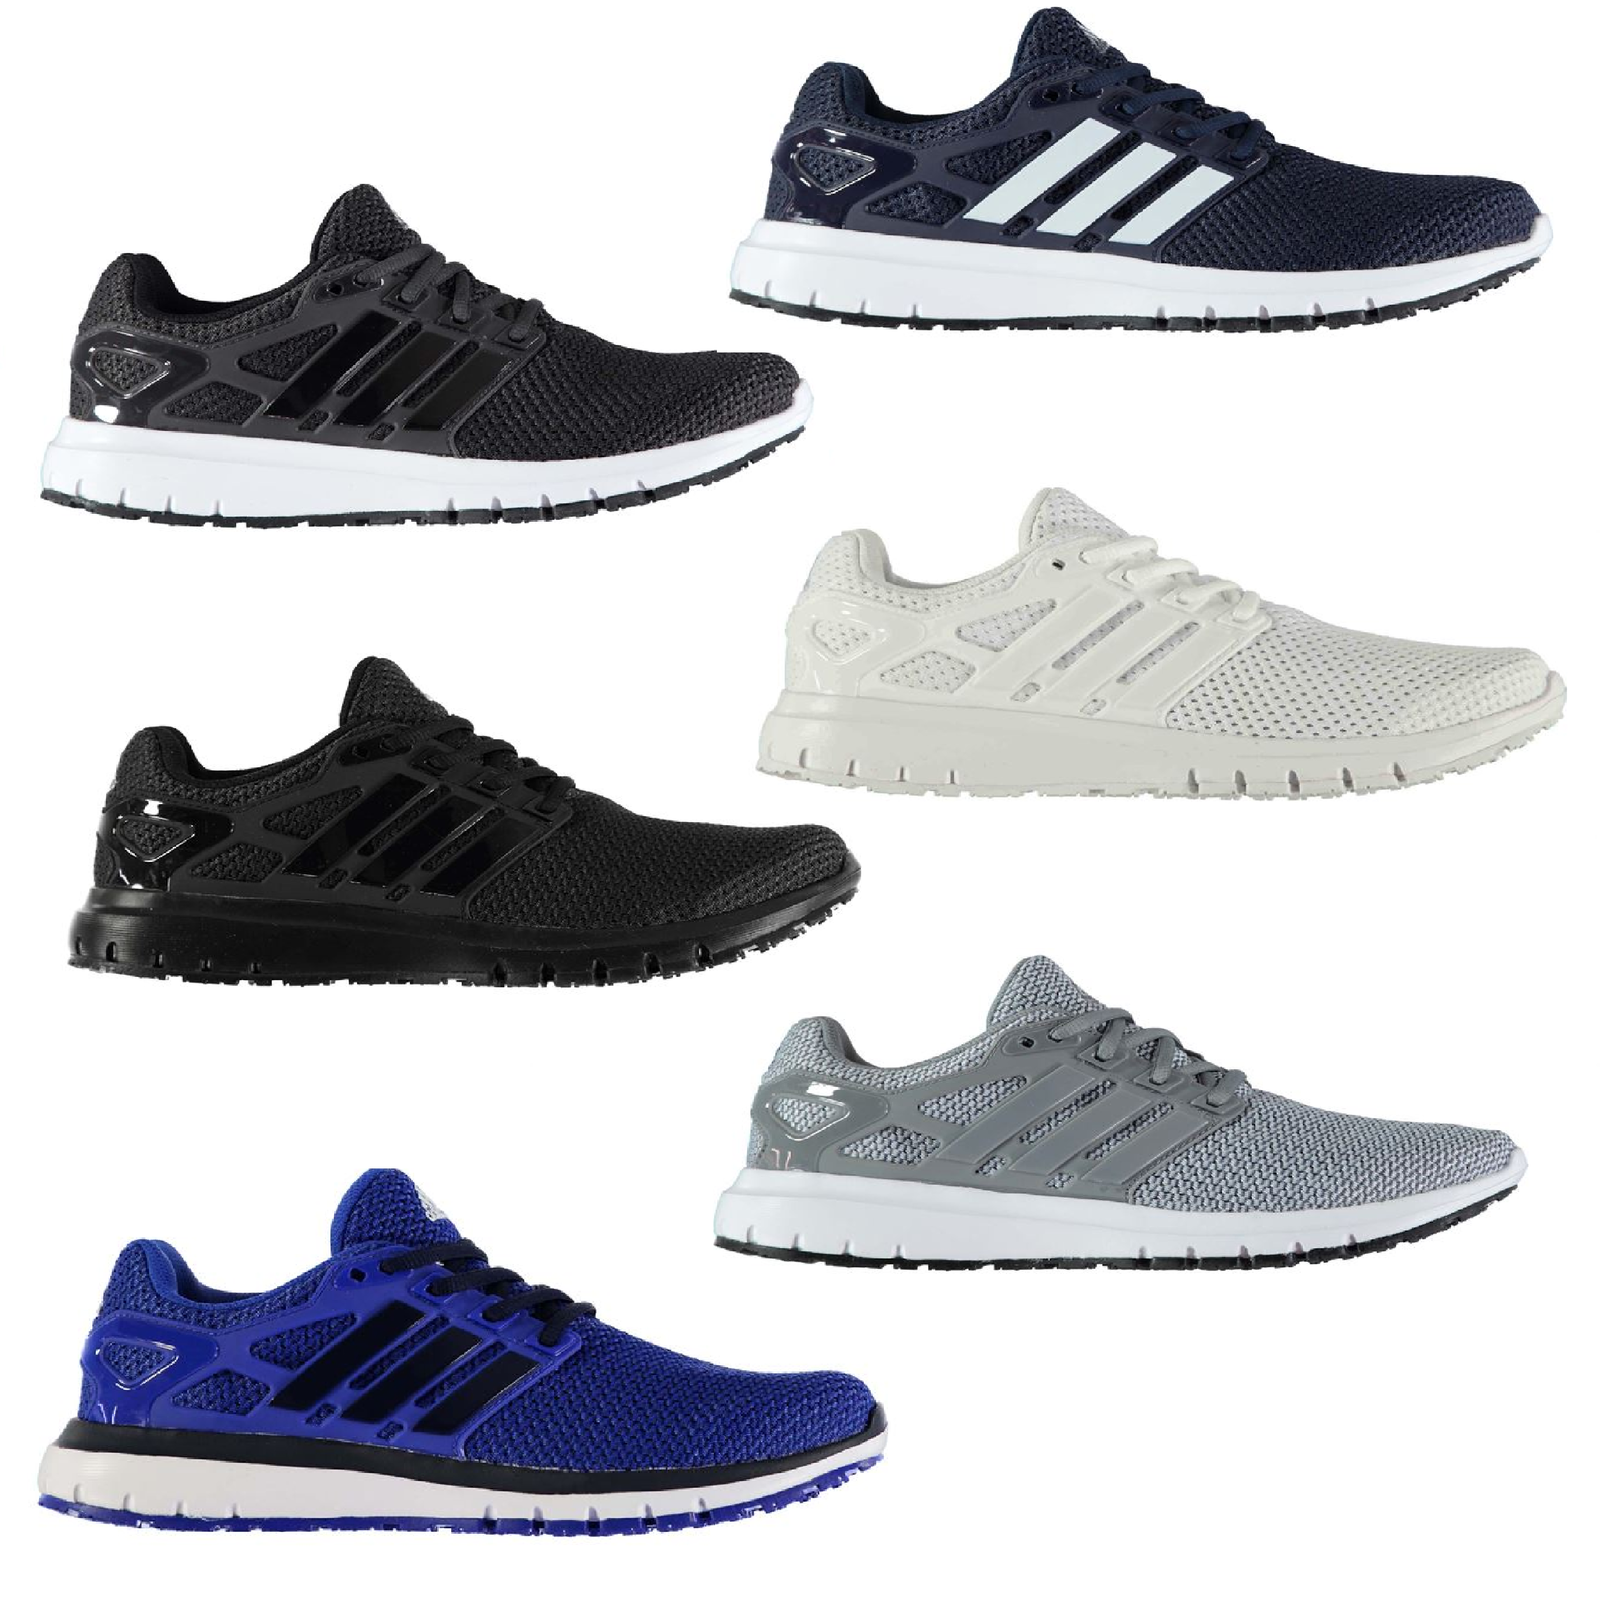 adidas Herren Schuhe Turnschuhe Laufschuhe Sneakers Trainers Fitness Energy 40